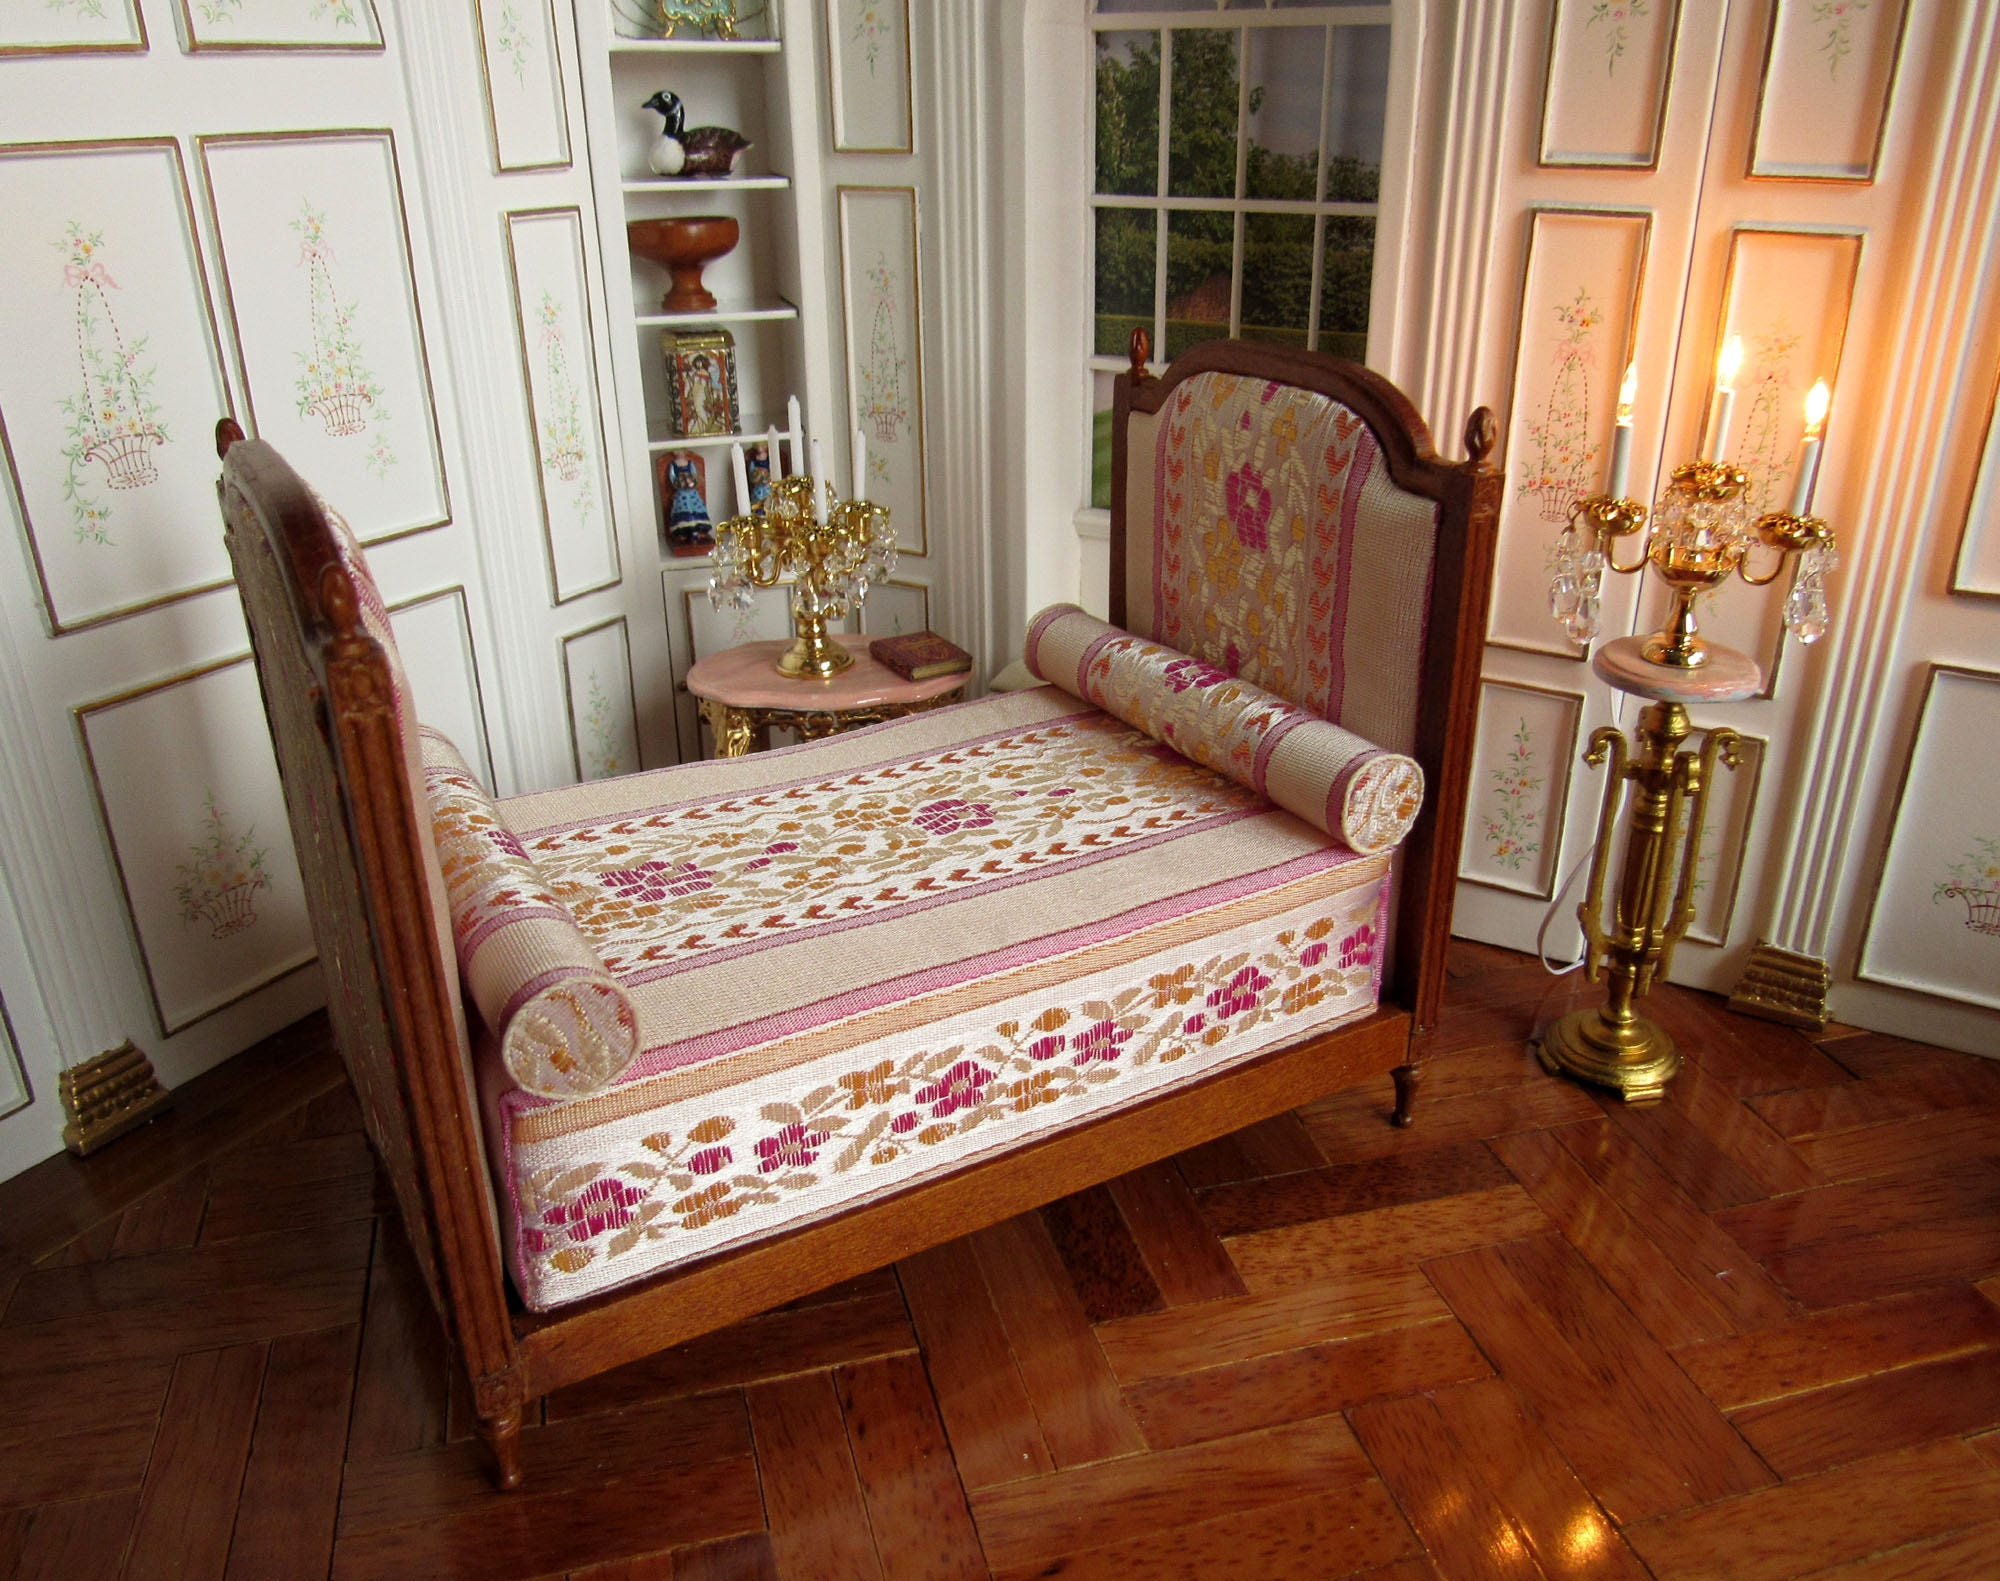 12 skala puppen haus franz sisch duchesse bett walnuss etsy. Black Bedroom Furniture Sets. Home Design Ideas